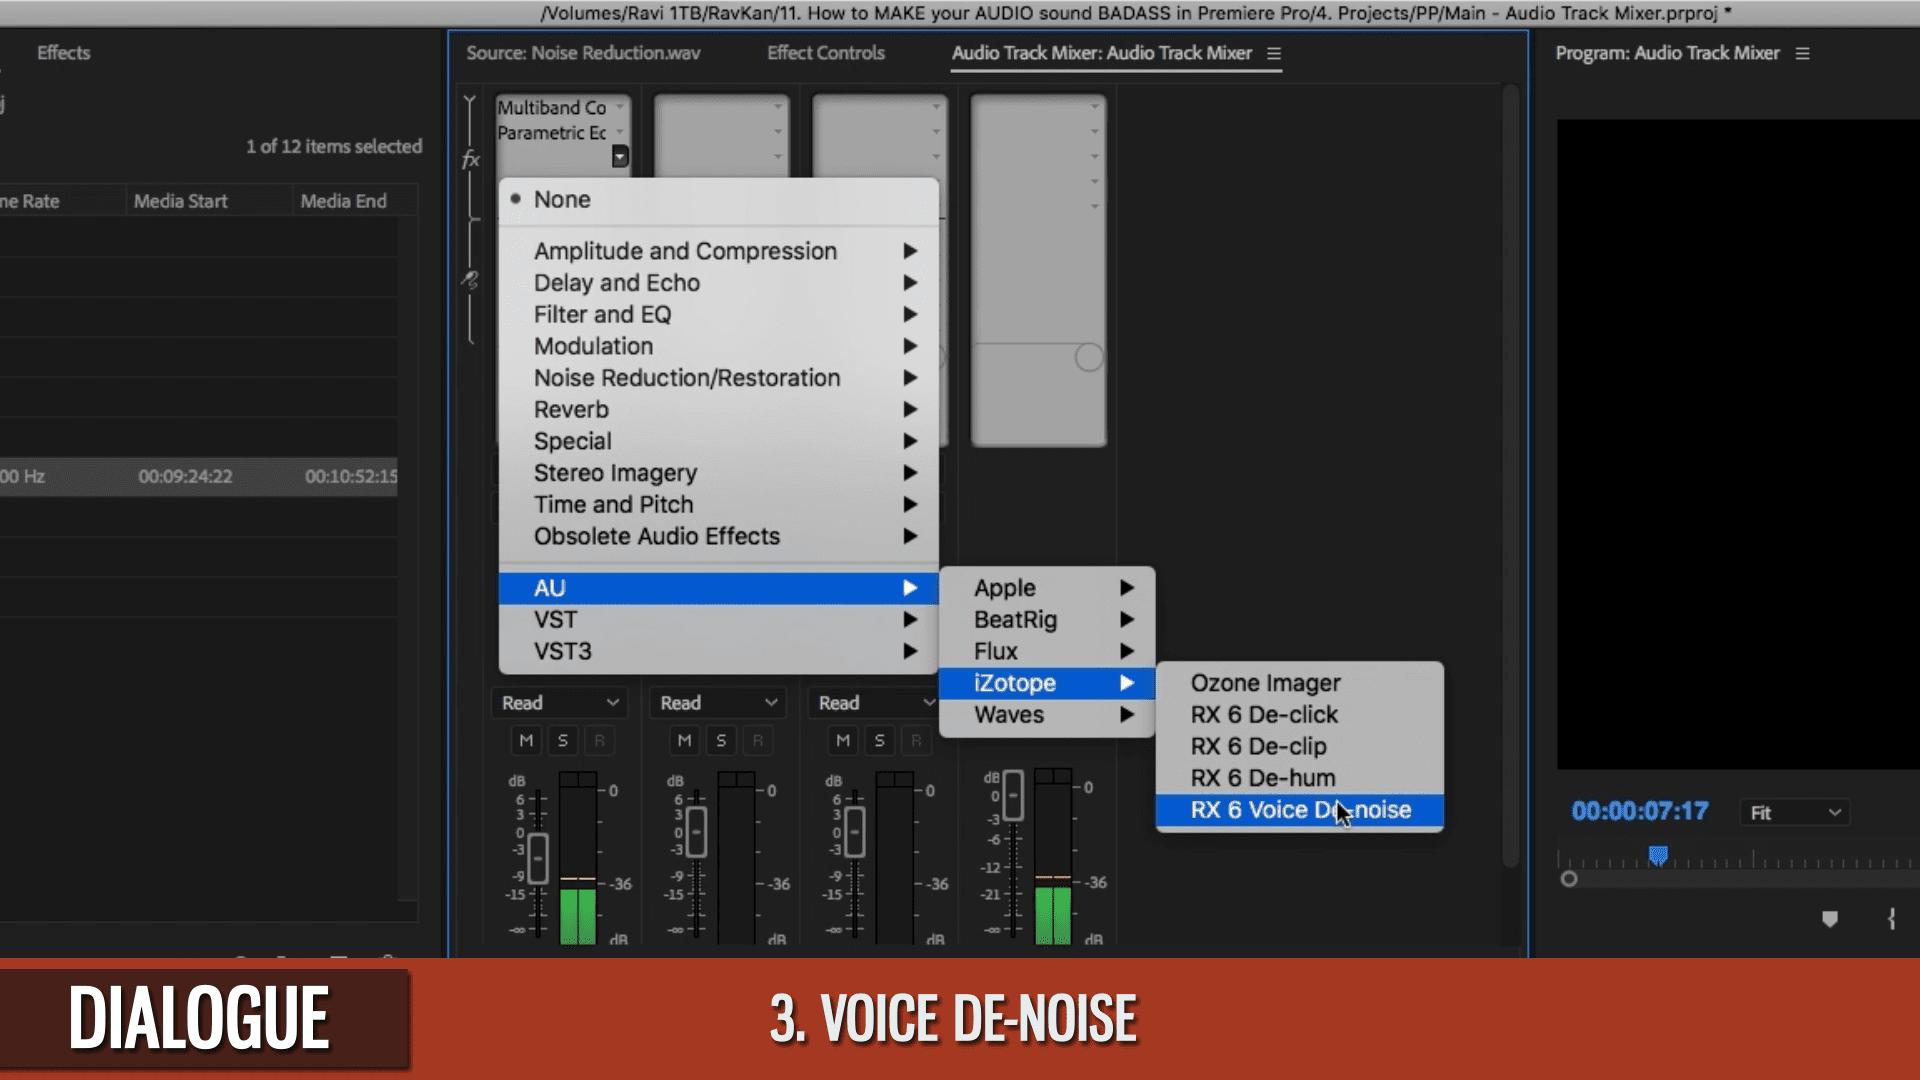 How to MAKE your AUDIO sound BADASS | 2020 15